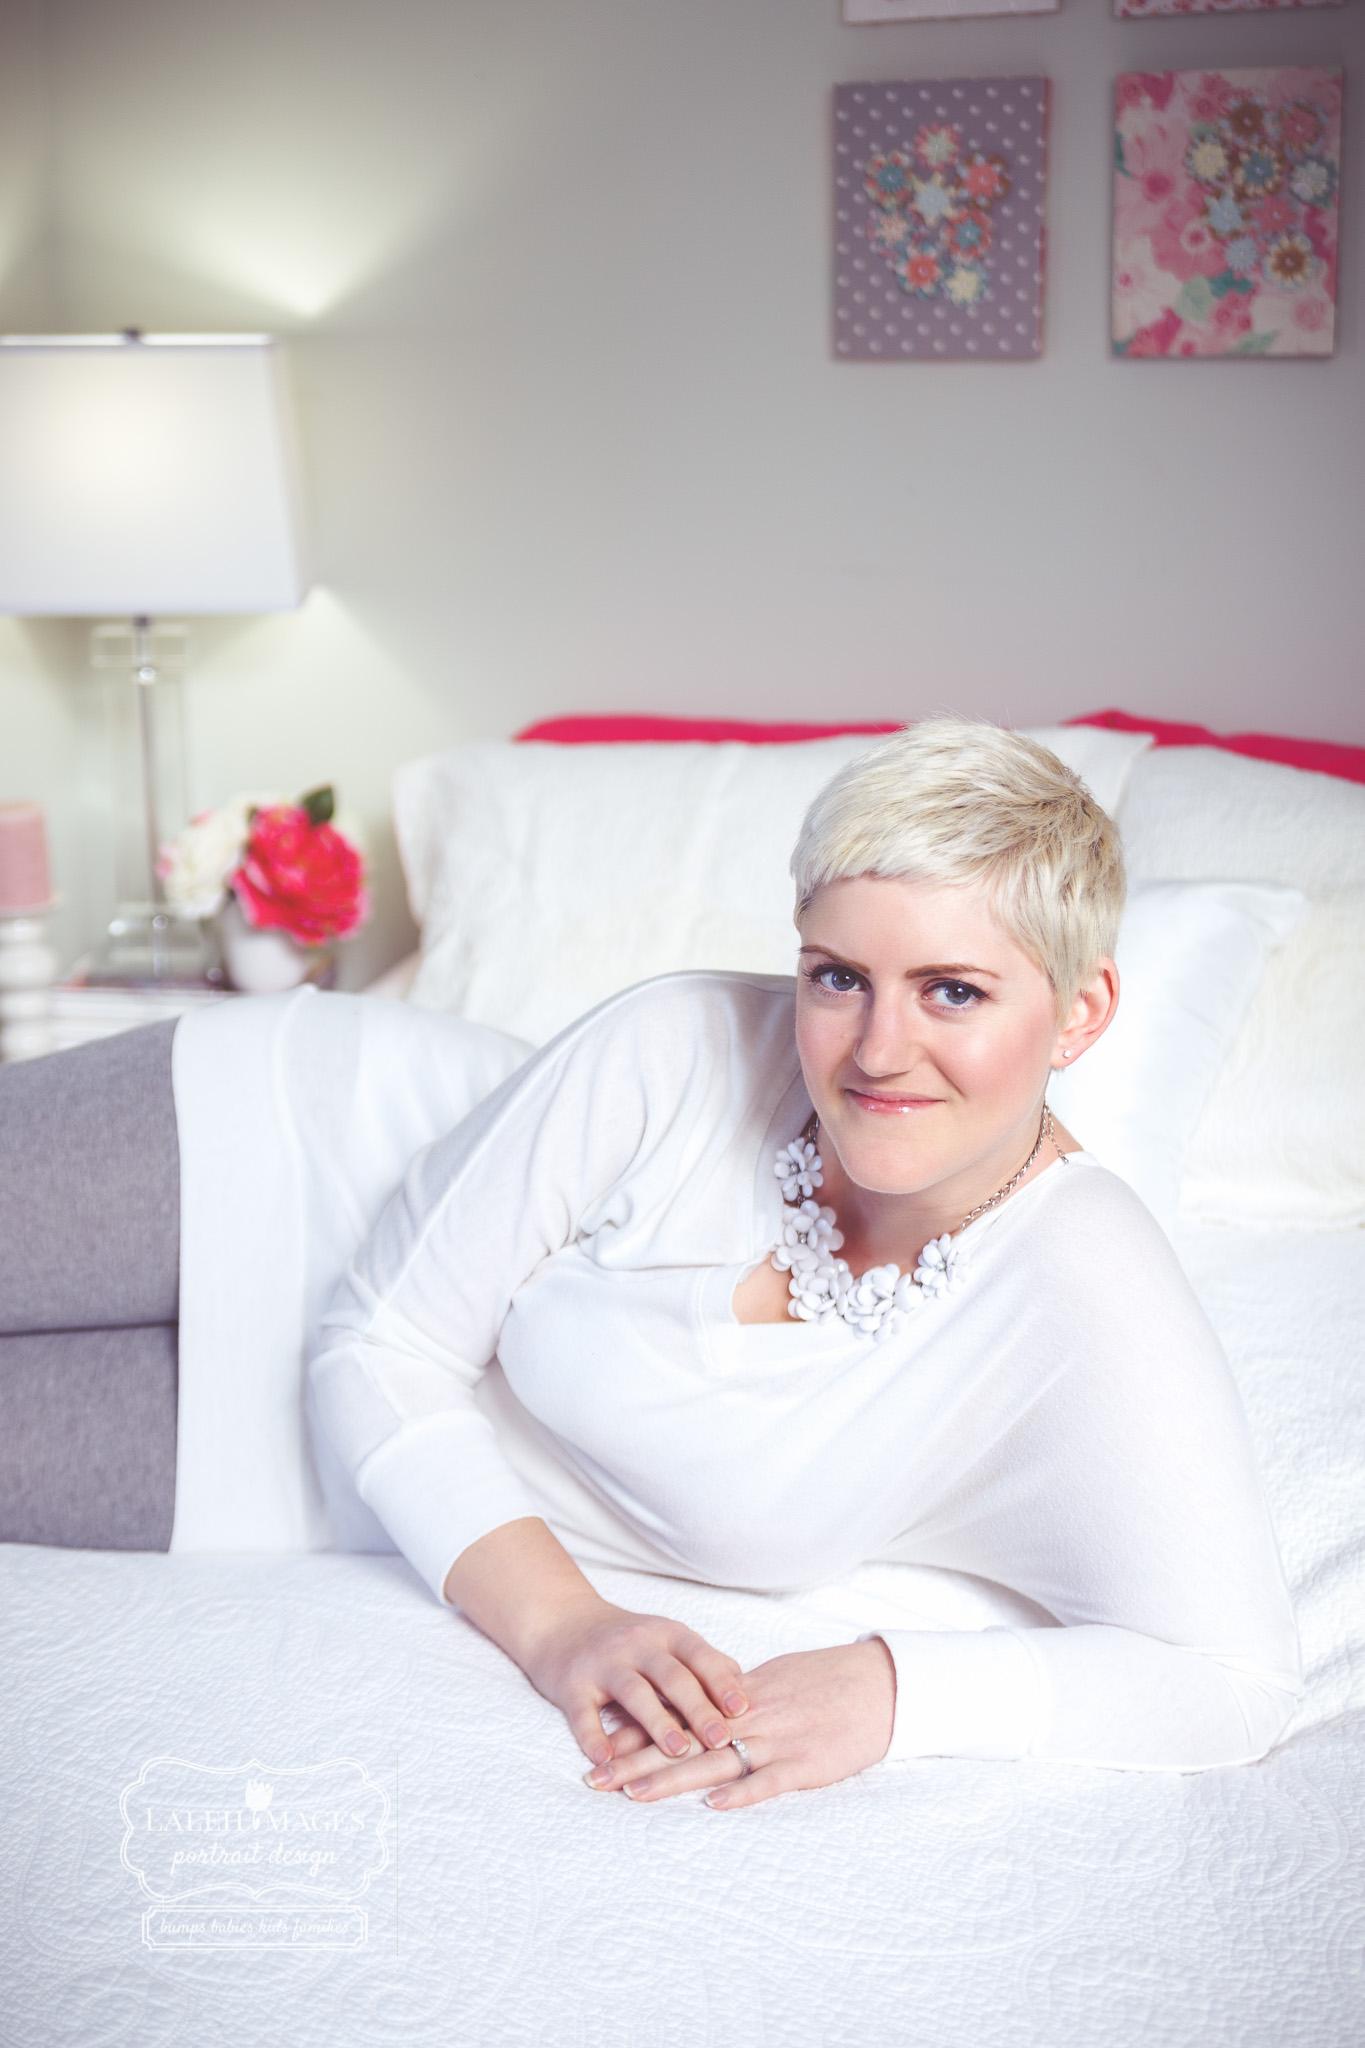 Melissa Morse, owner of Laleh Images Portrait Design